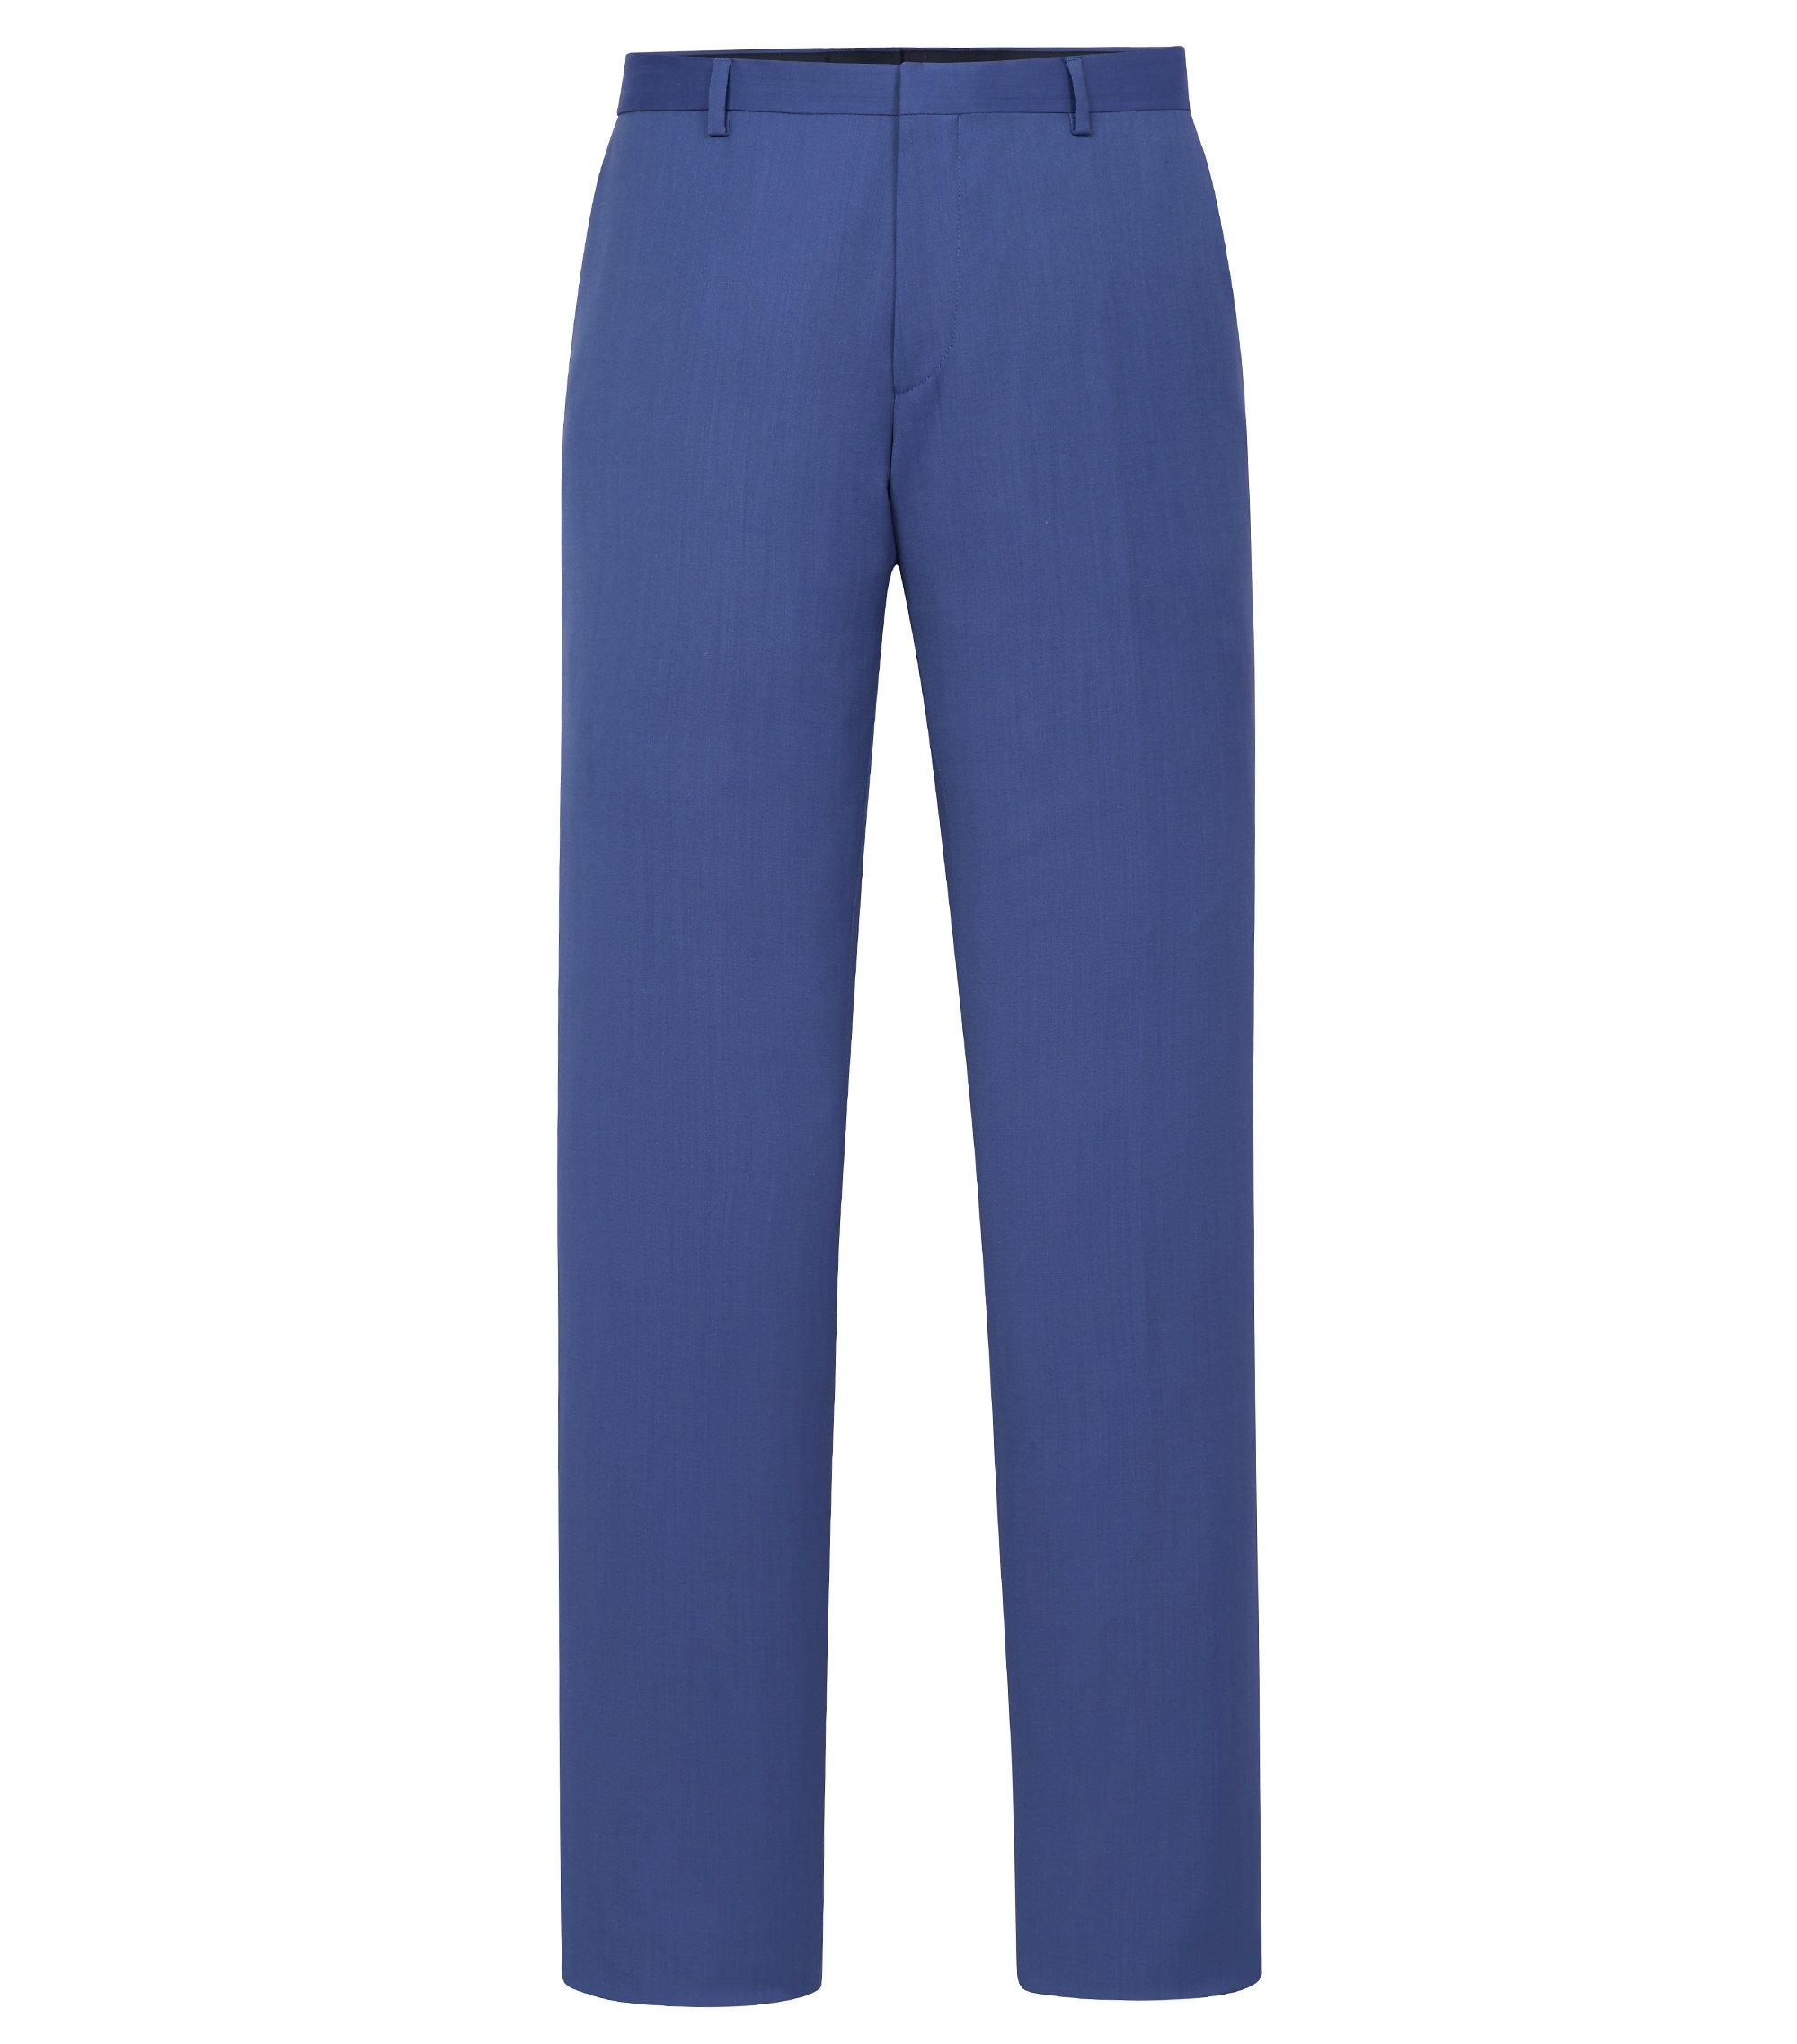 Italian Virgin Wool Dress Pant, Slim Fit | Genesis, Blue